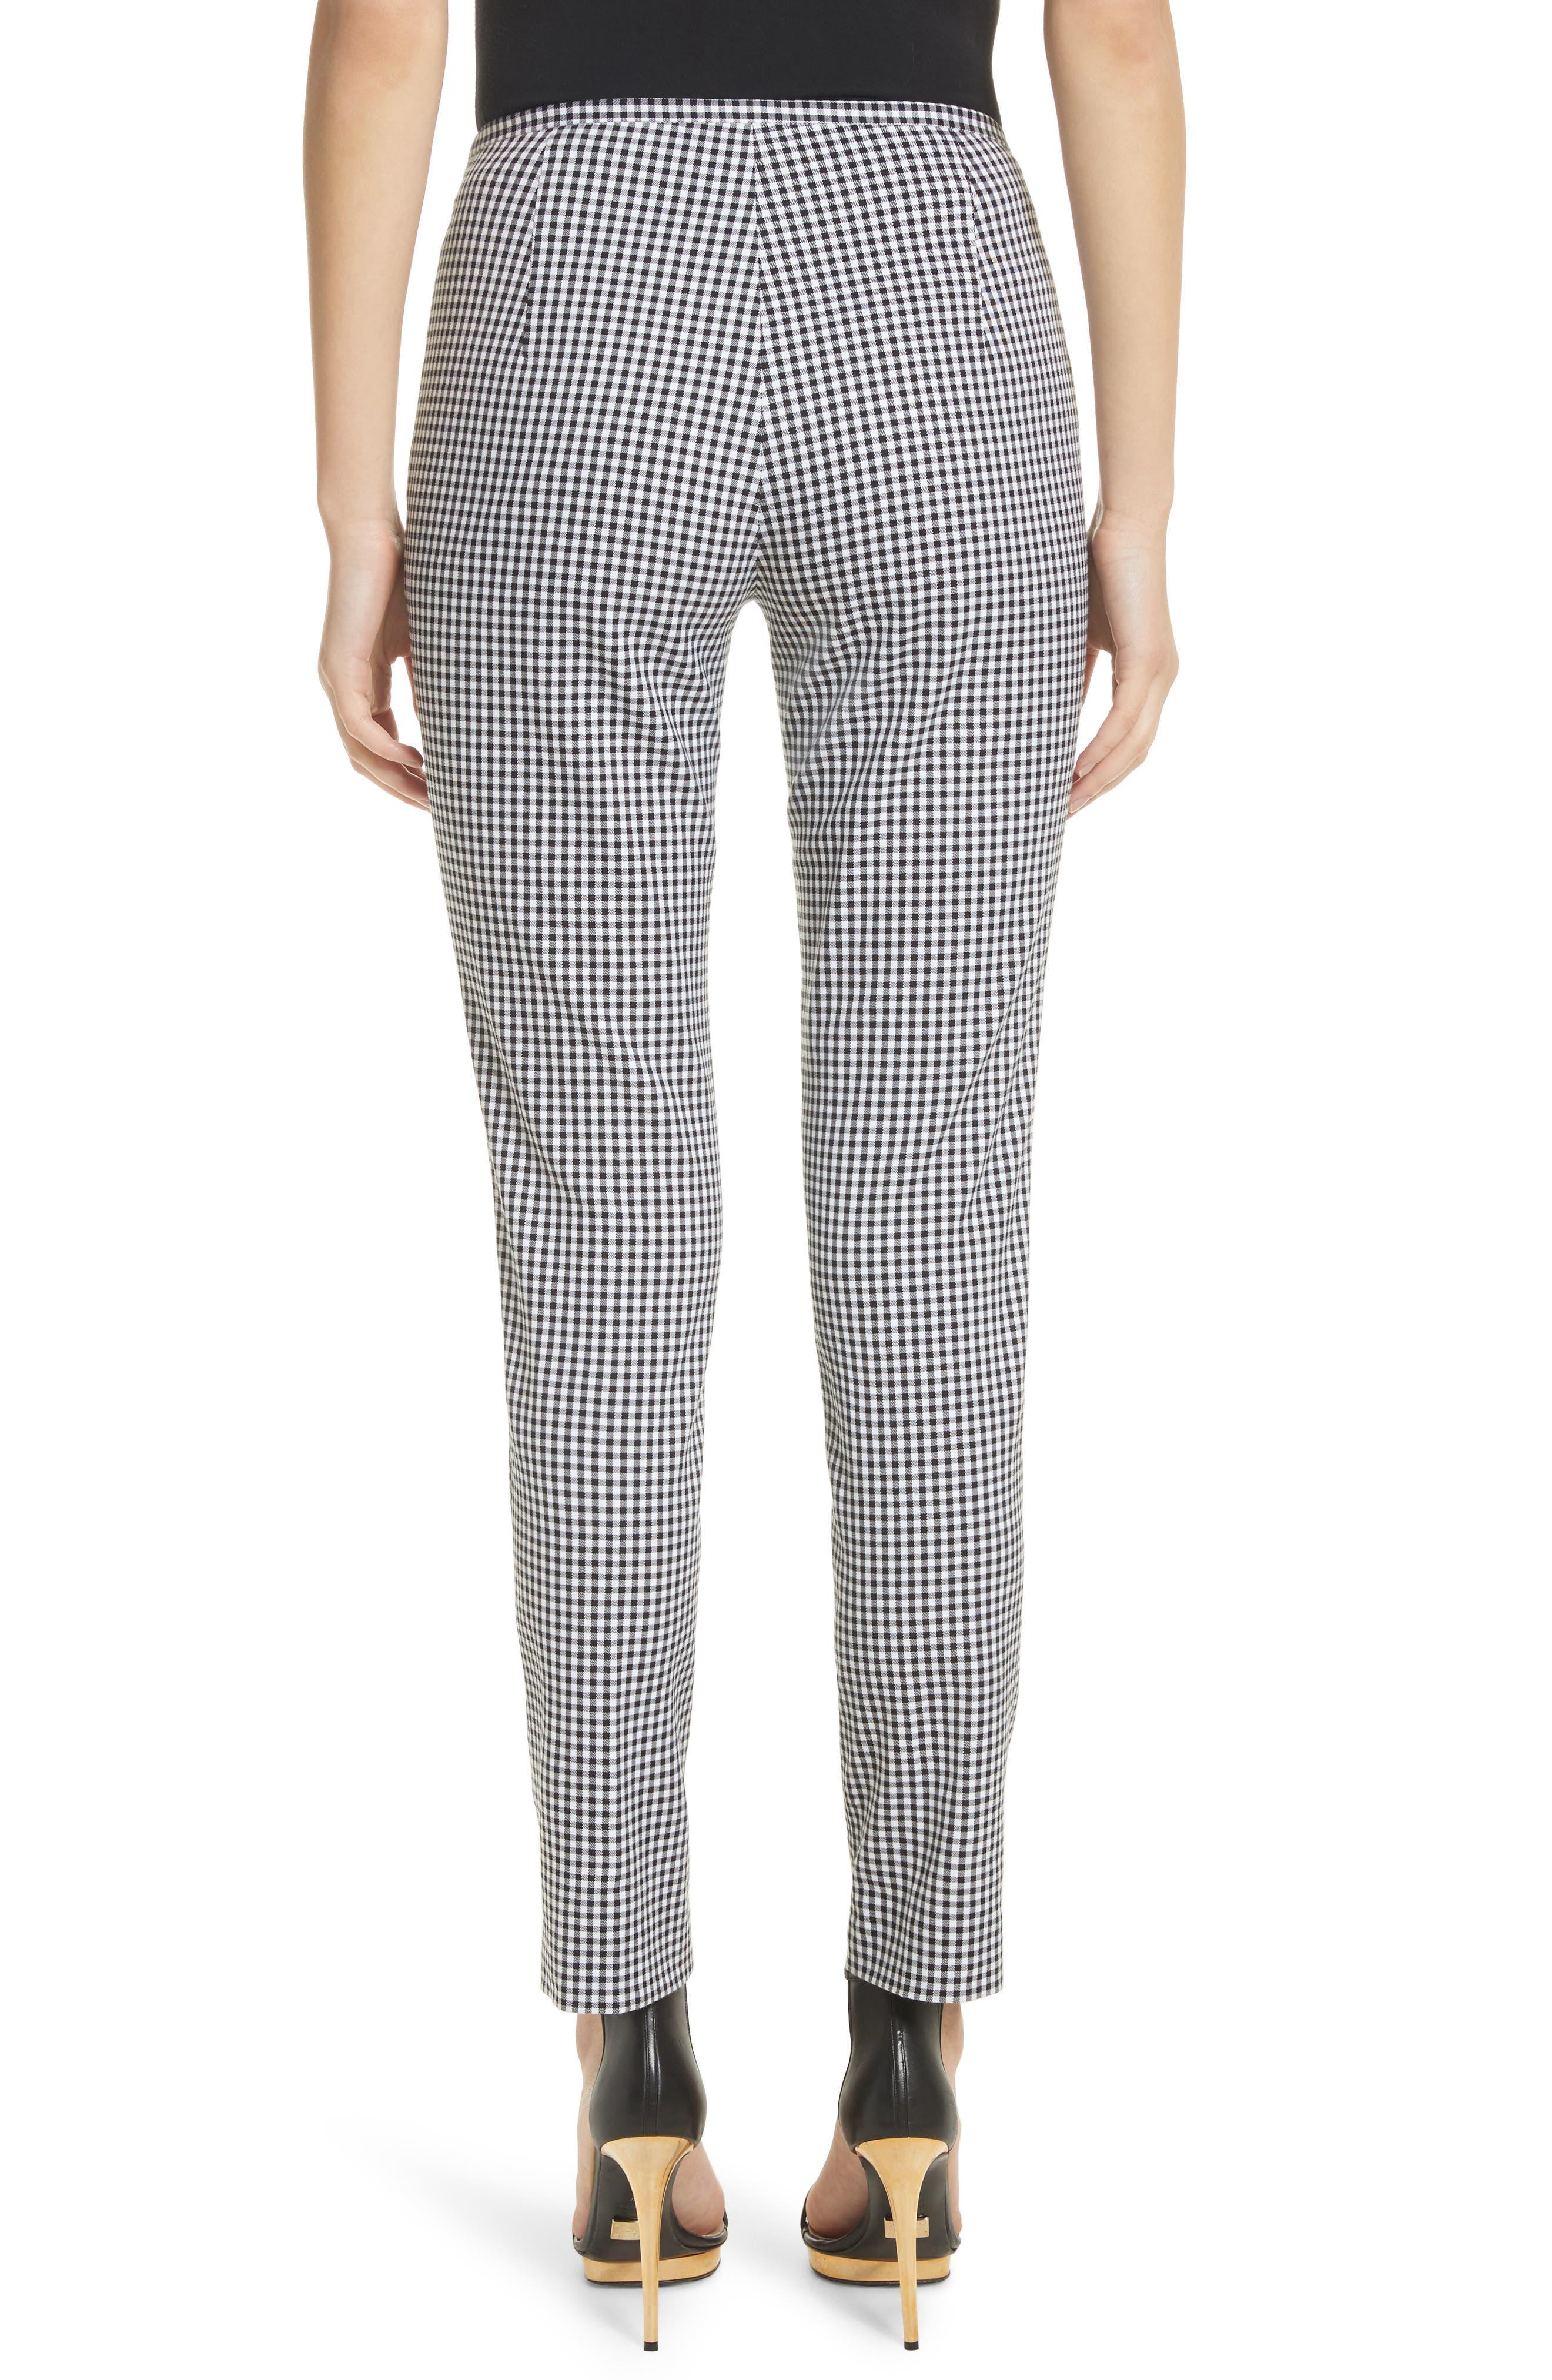 Gingham Stretch Cotton Pants,                             Alternate thumbnail 3, color,                             Black / White